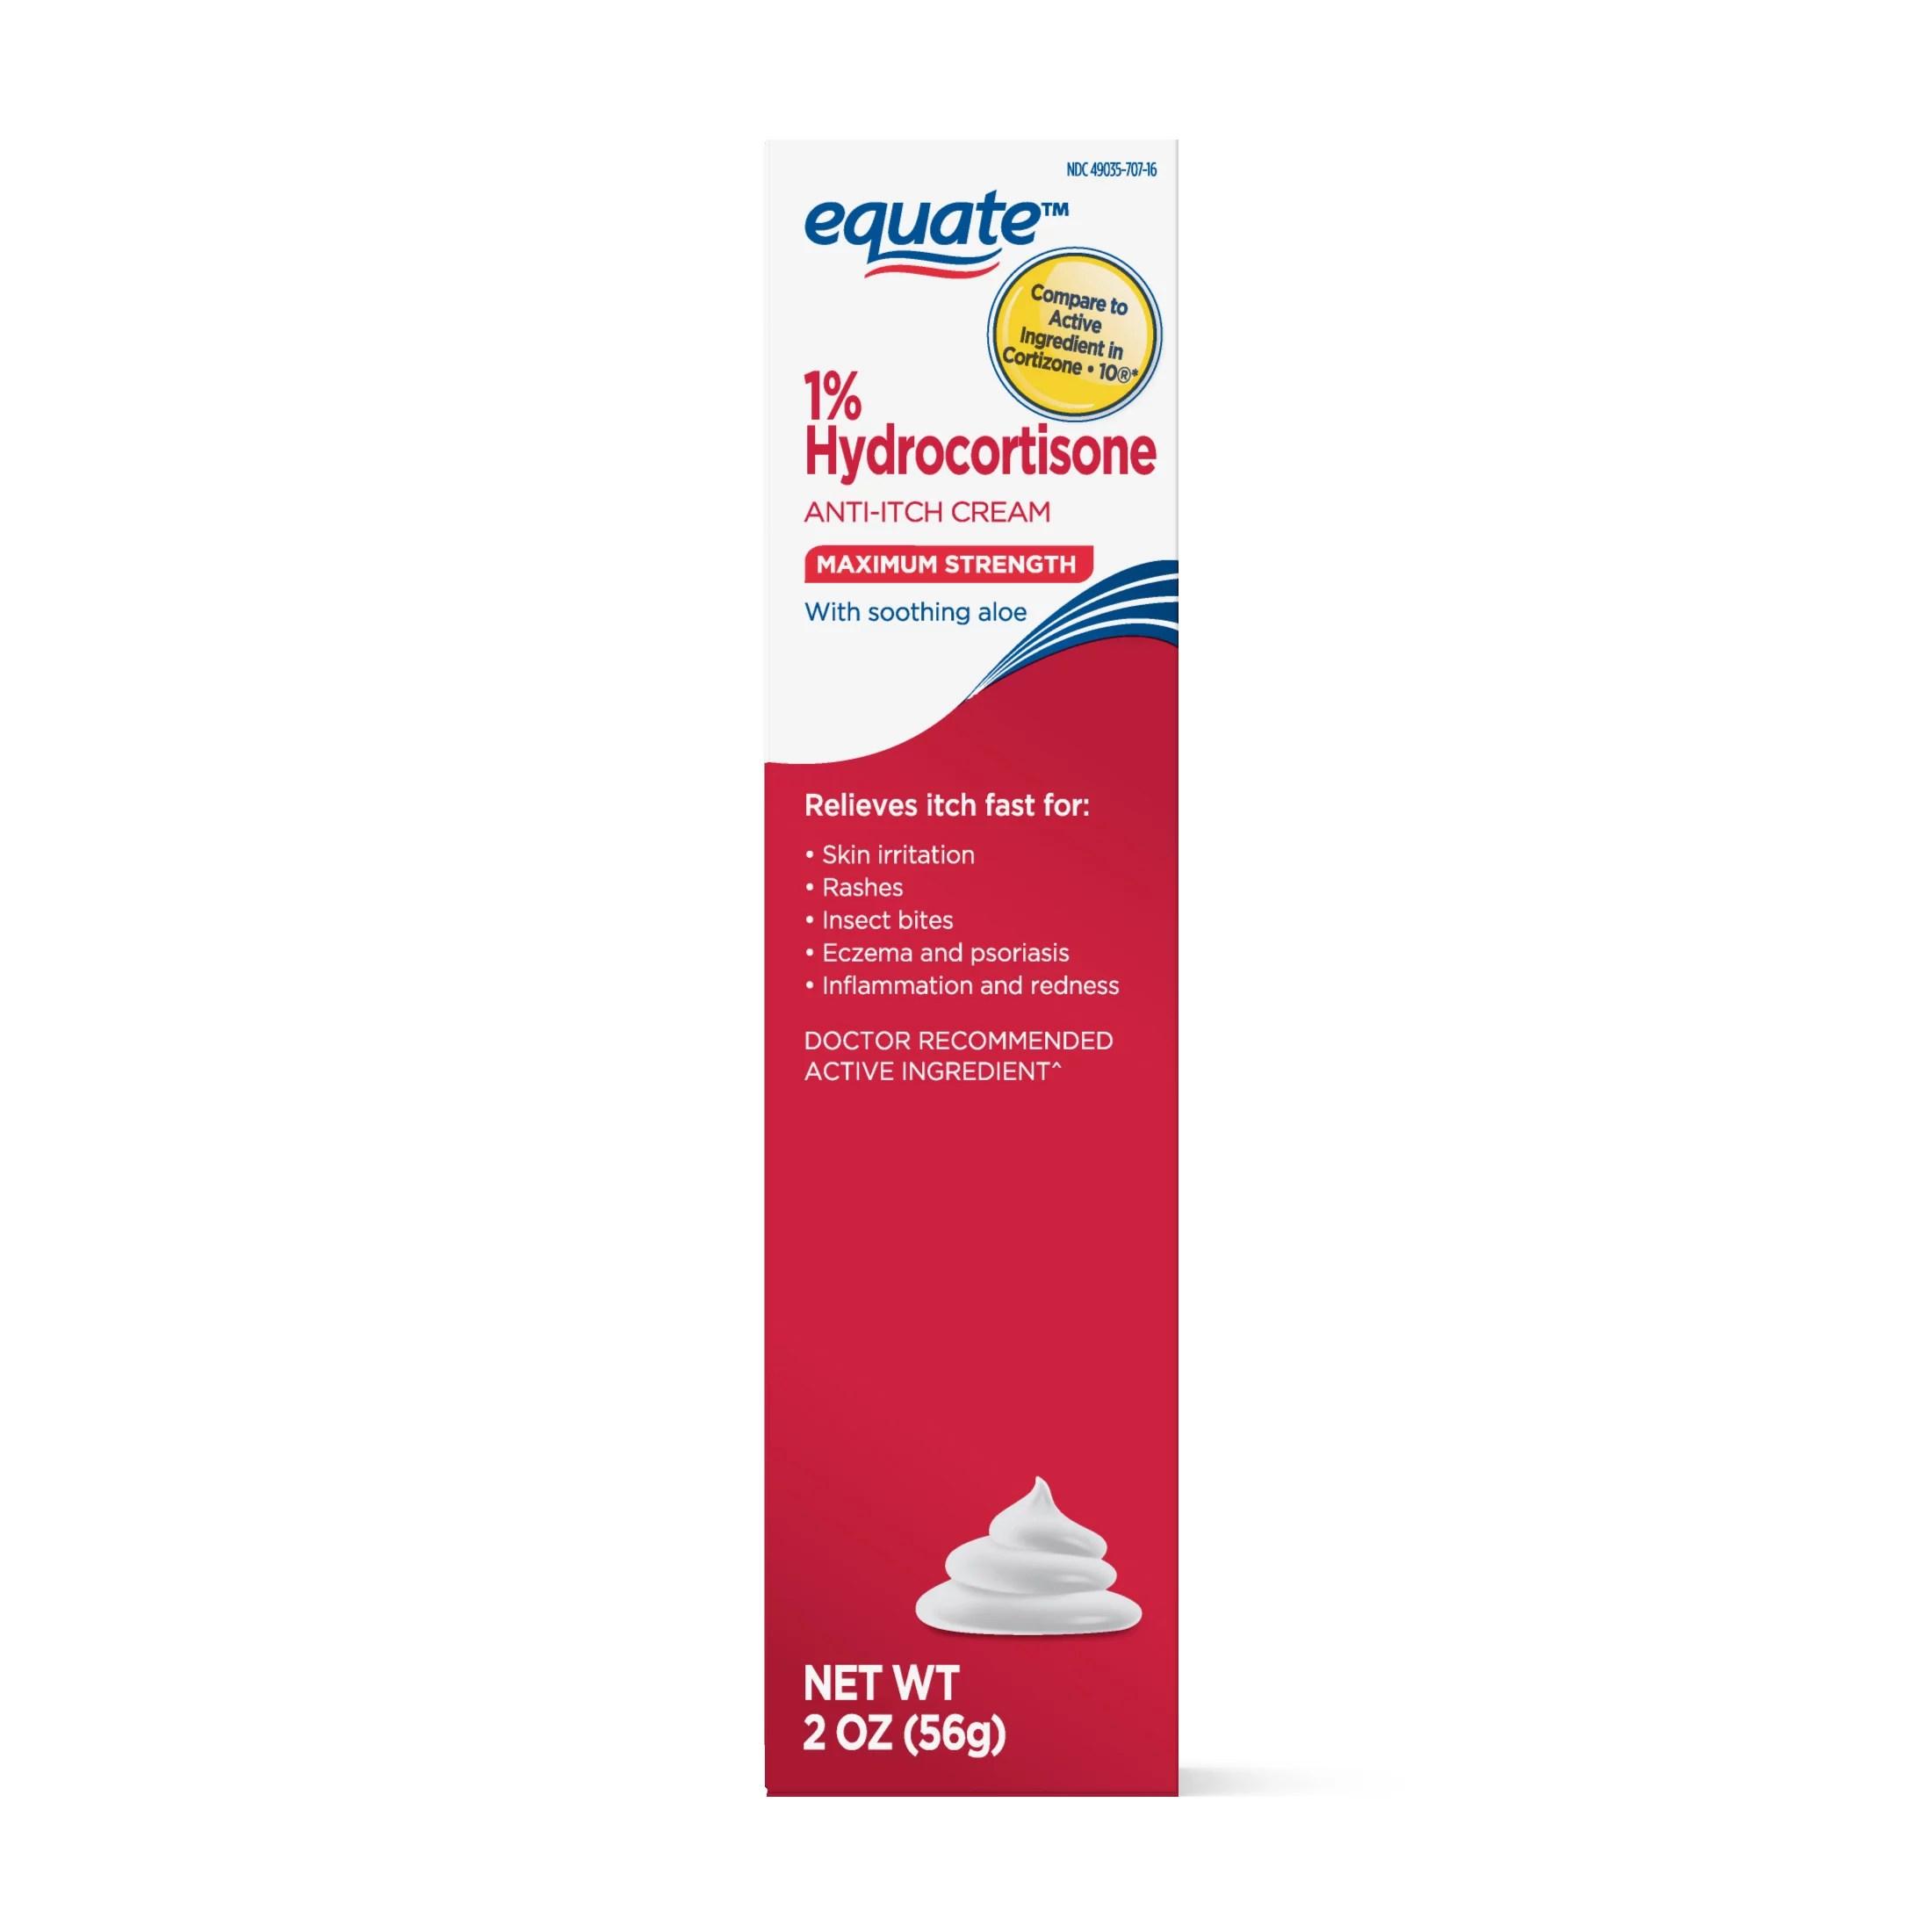 Equate Hydrocortisone 1% Anti-itch Cream with Aloe ...